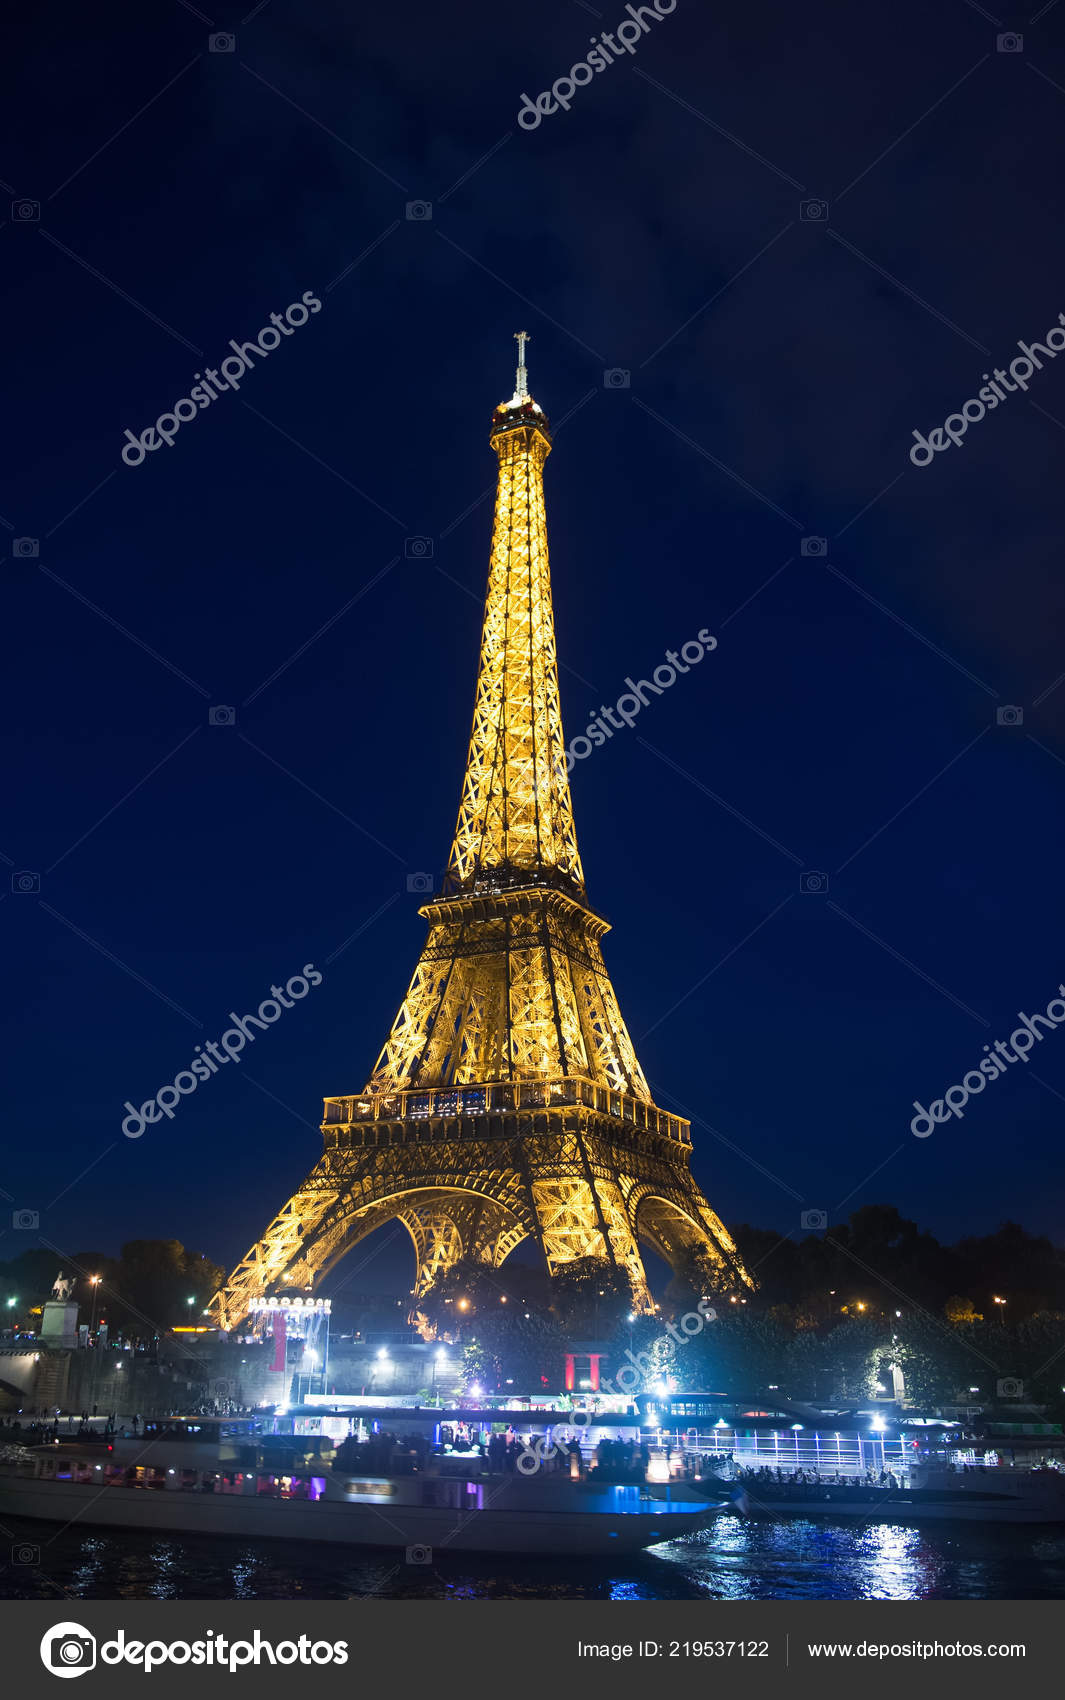 paris france september 23 2017 icon of paris eiffel tower on